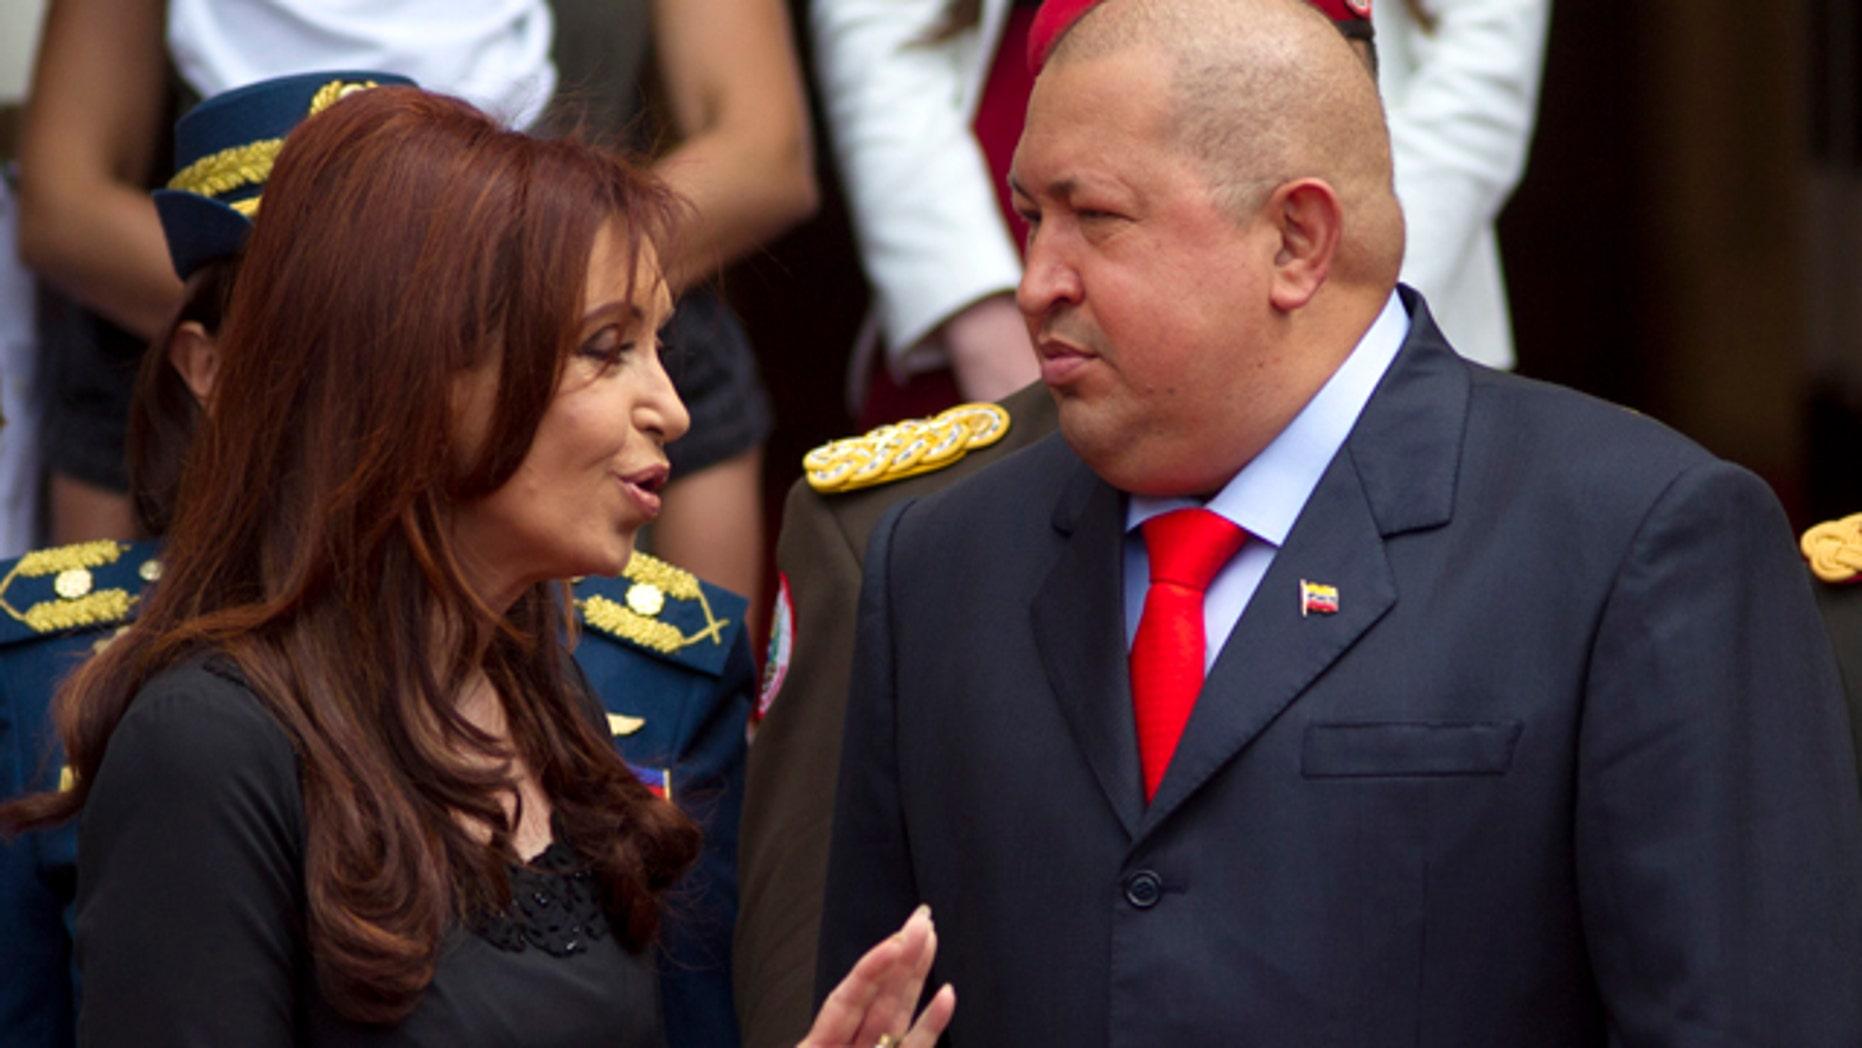 Dec. 1: Argentinas President Cristina Fernandez speaks with Venezuelas President Hugo Chavez during a ceremony upon Fernandezs arrival to Miraflores presidential palace in Caracas.